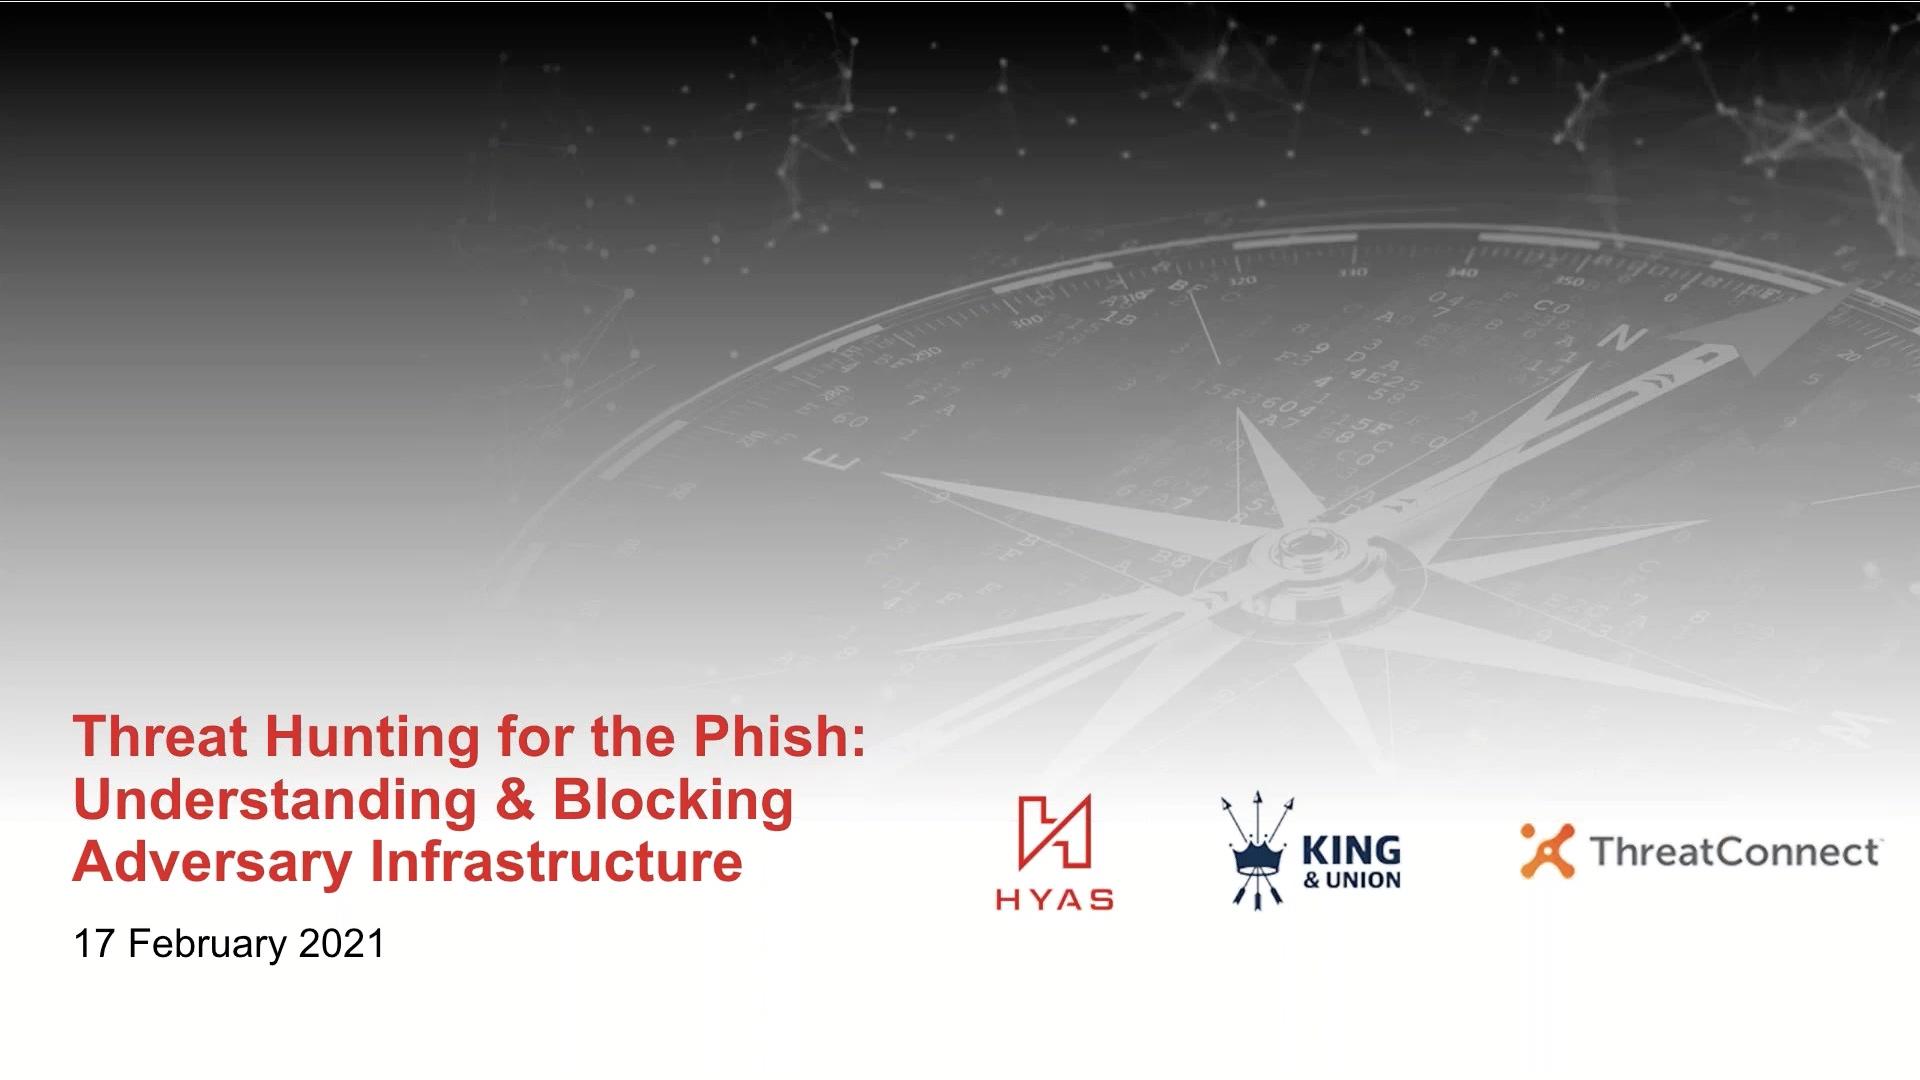 TC-KU-HYAS-webinar2.hunt-for-phish.17feb2021-thumb